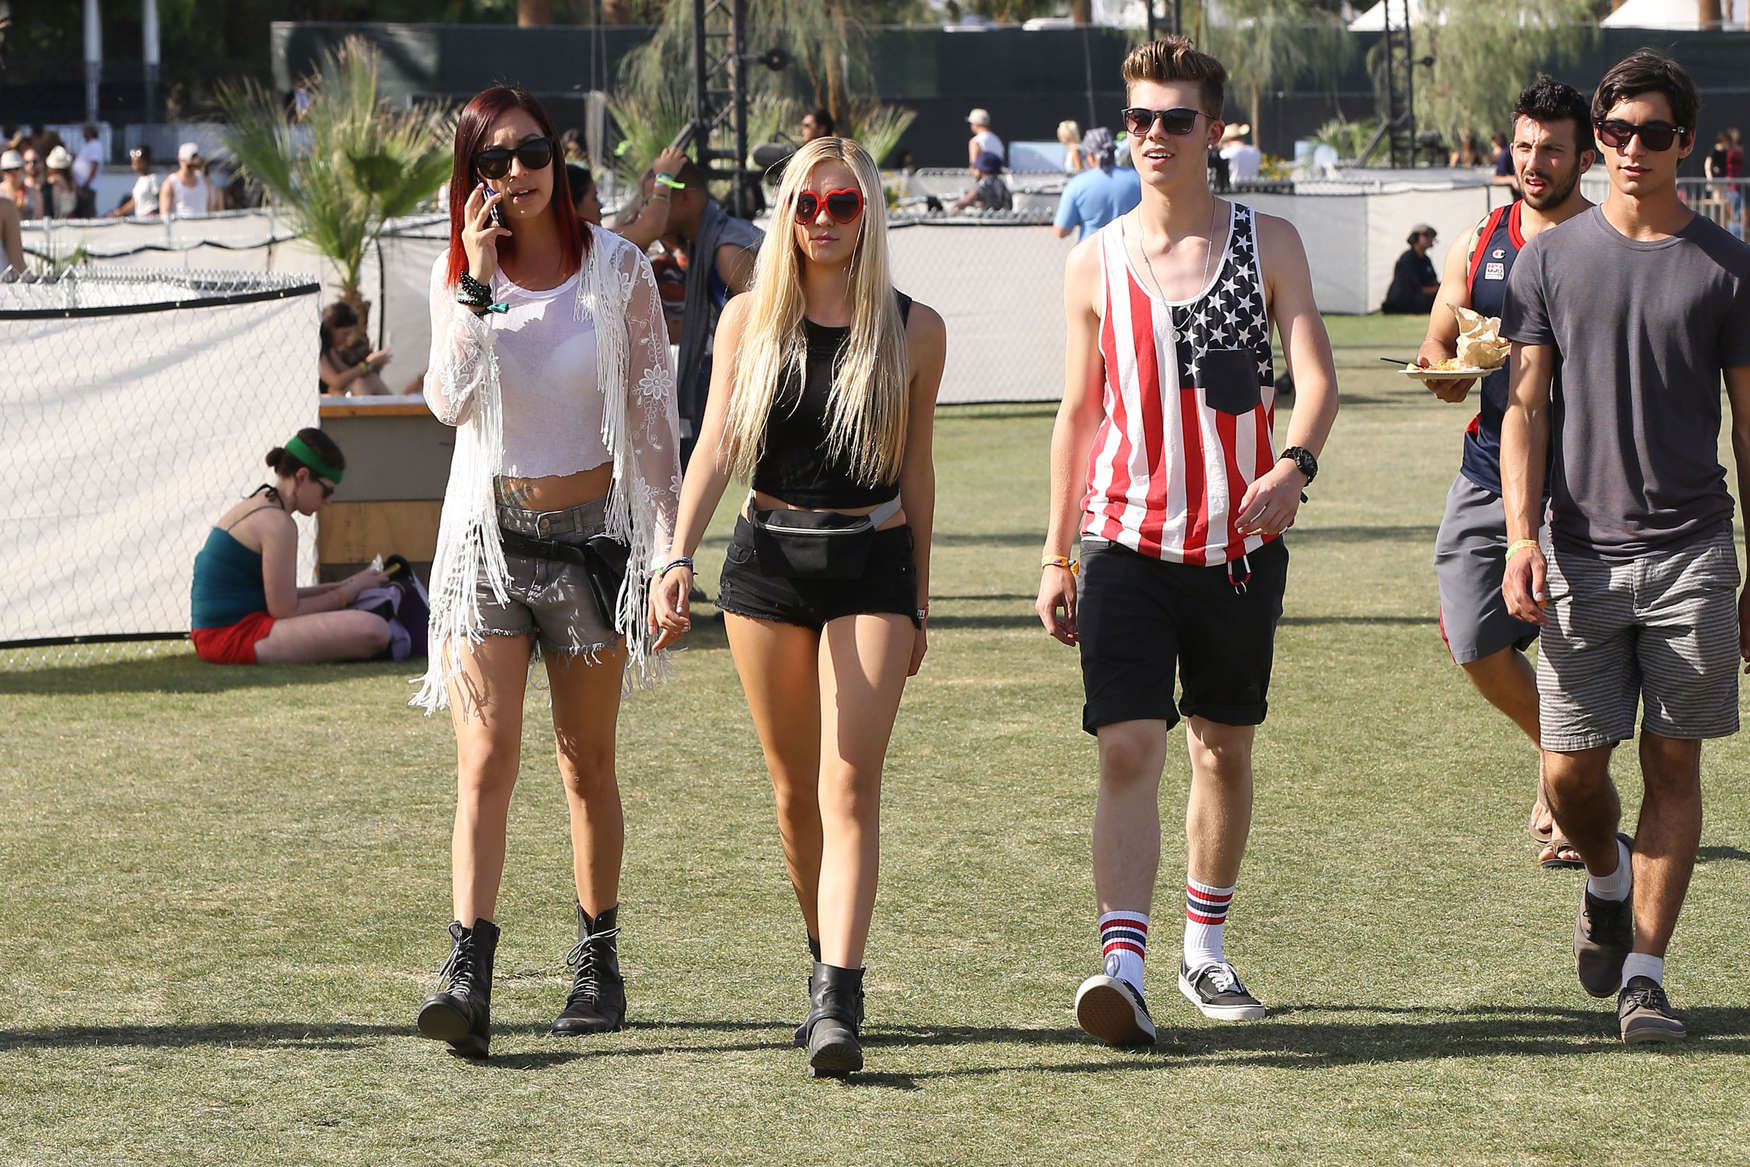 Ava Sambora Legs Show at Coachella 2014 -10